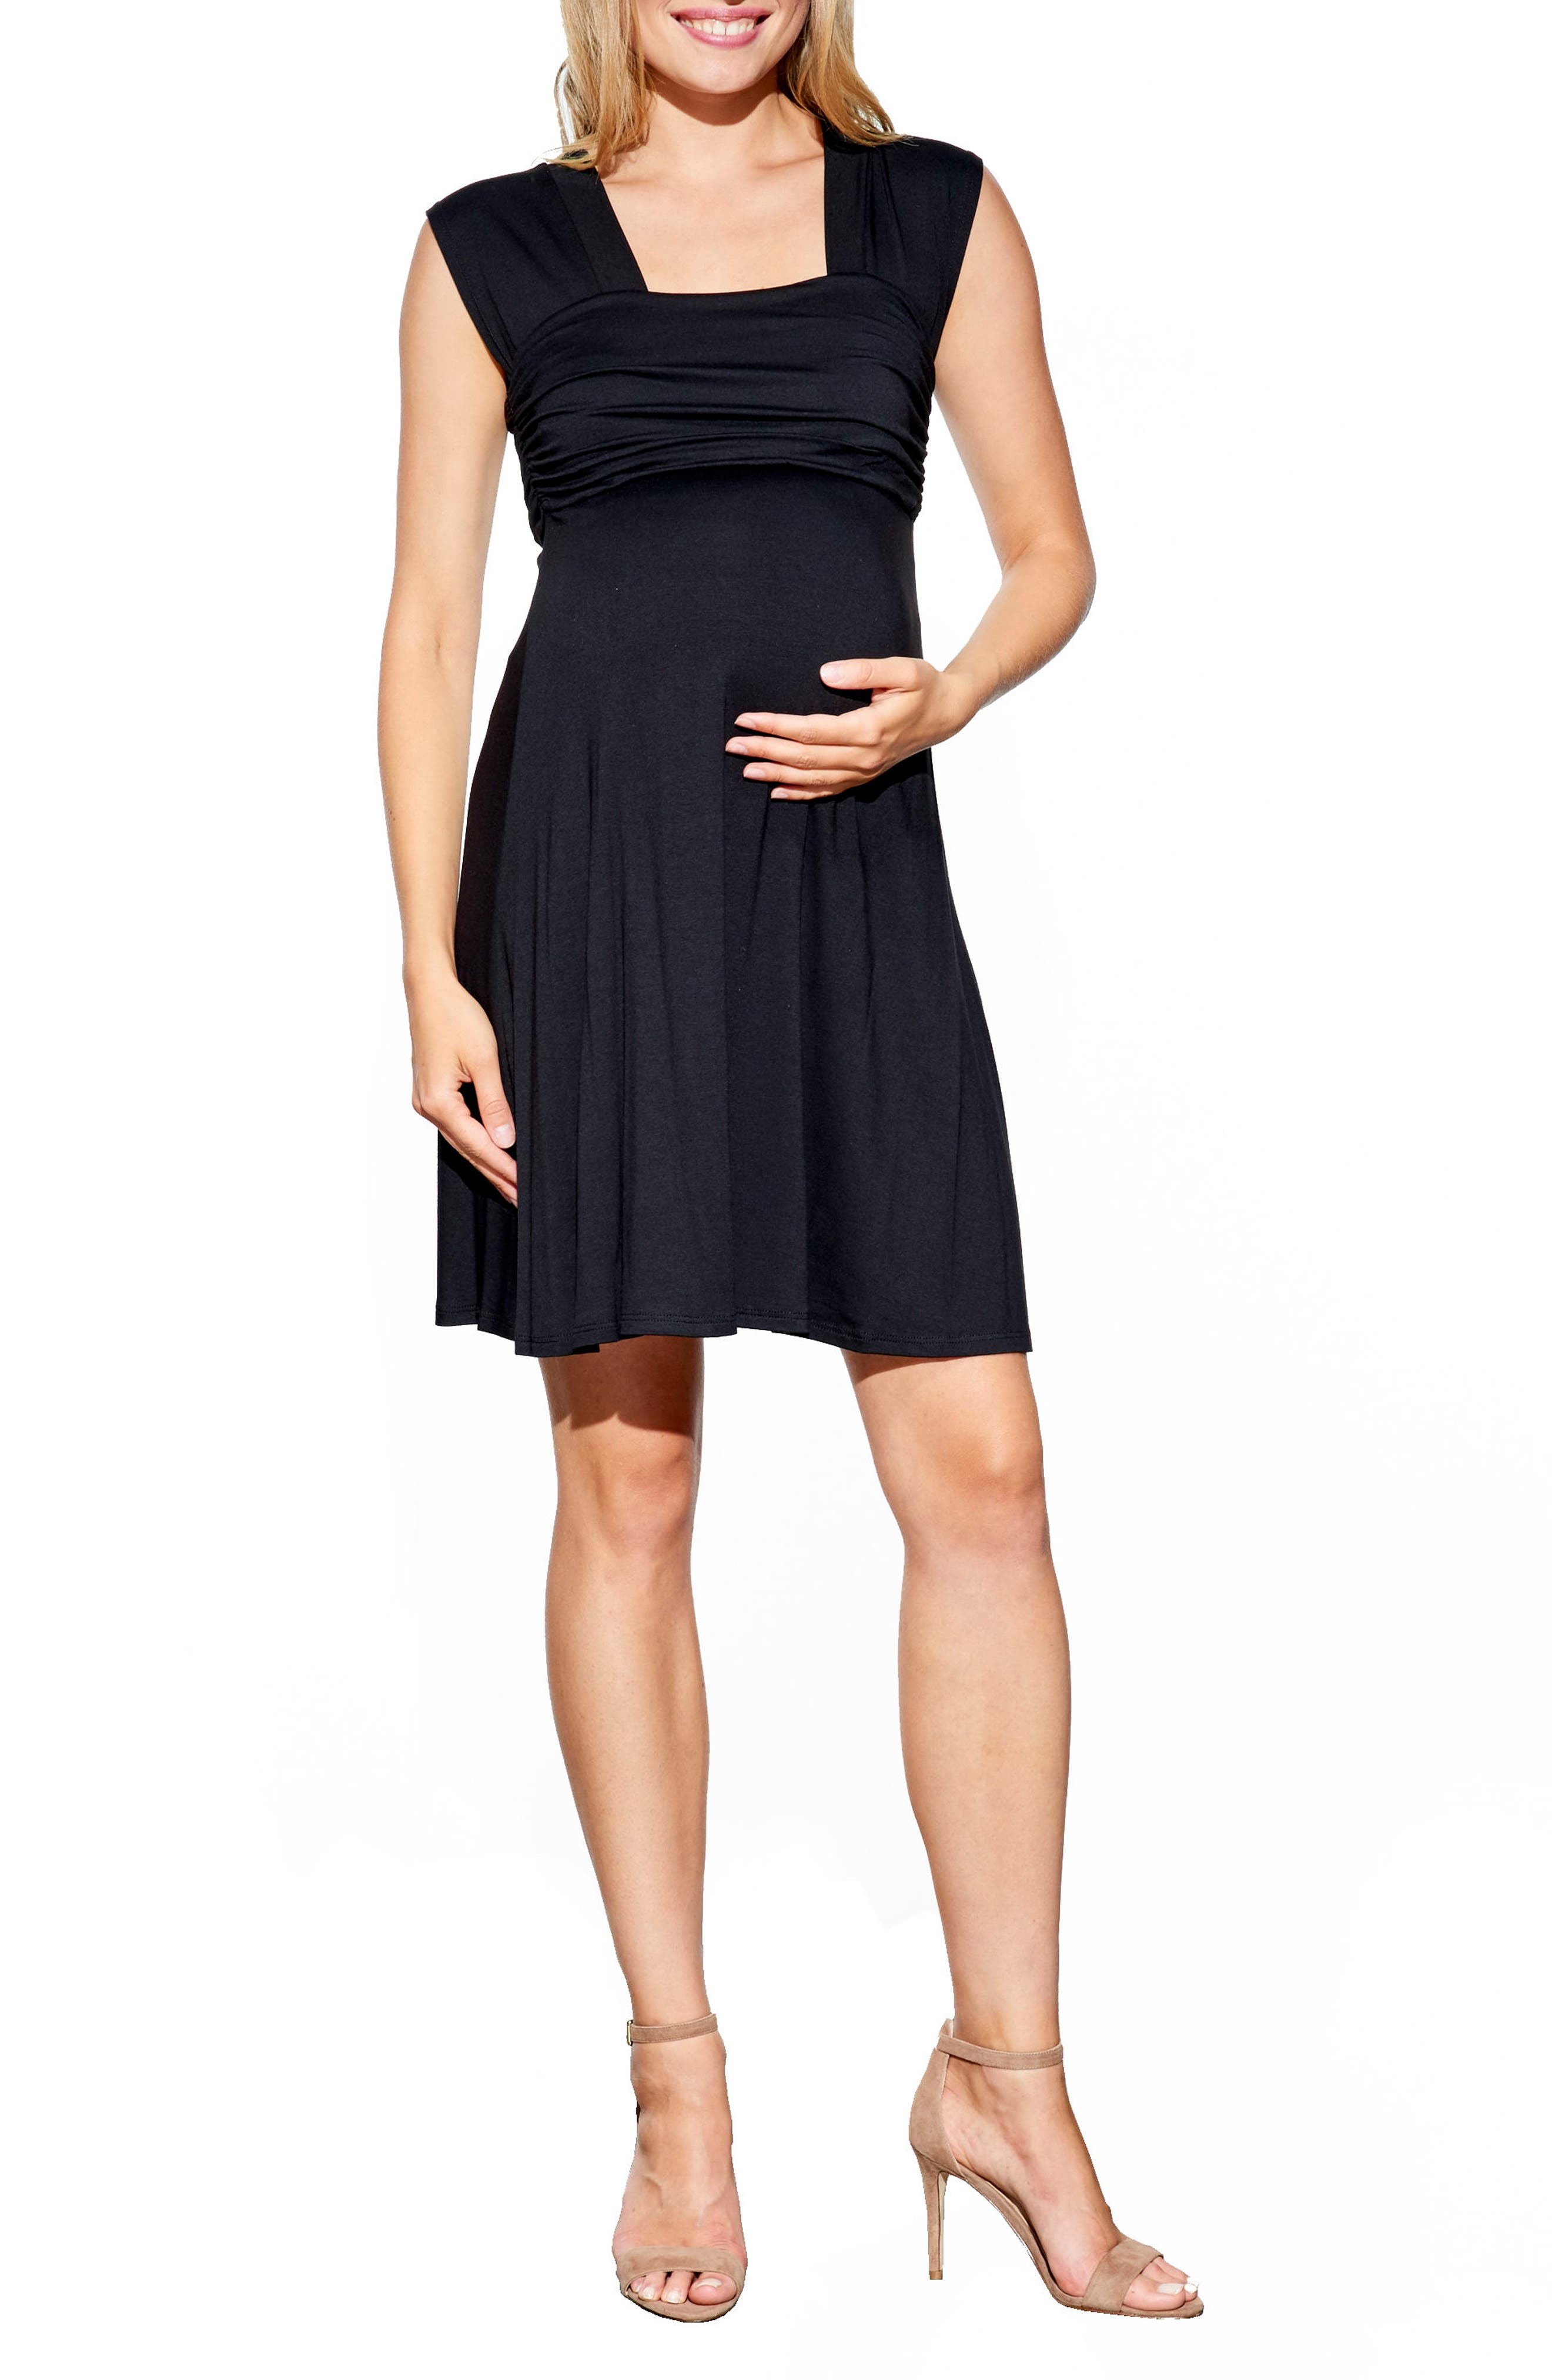 MATERNAL AMERICA, 'Mini Sweetheart' Dress, Main thumbnail 1, color, BLACK